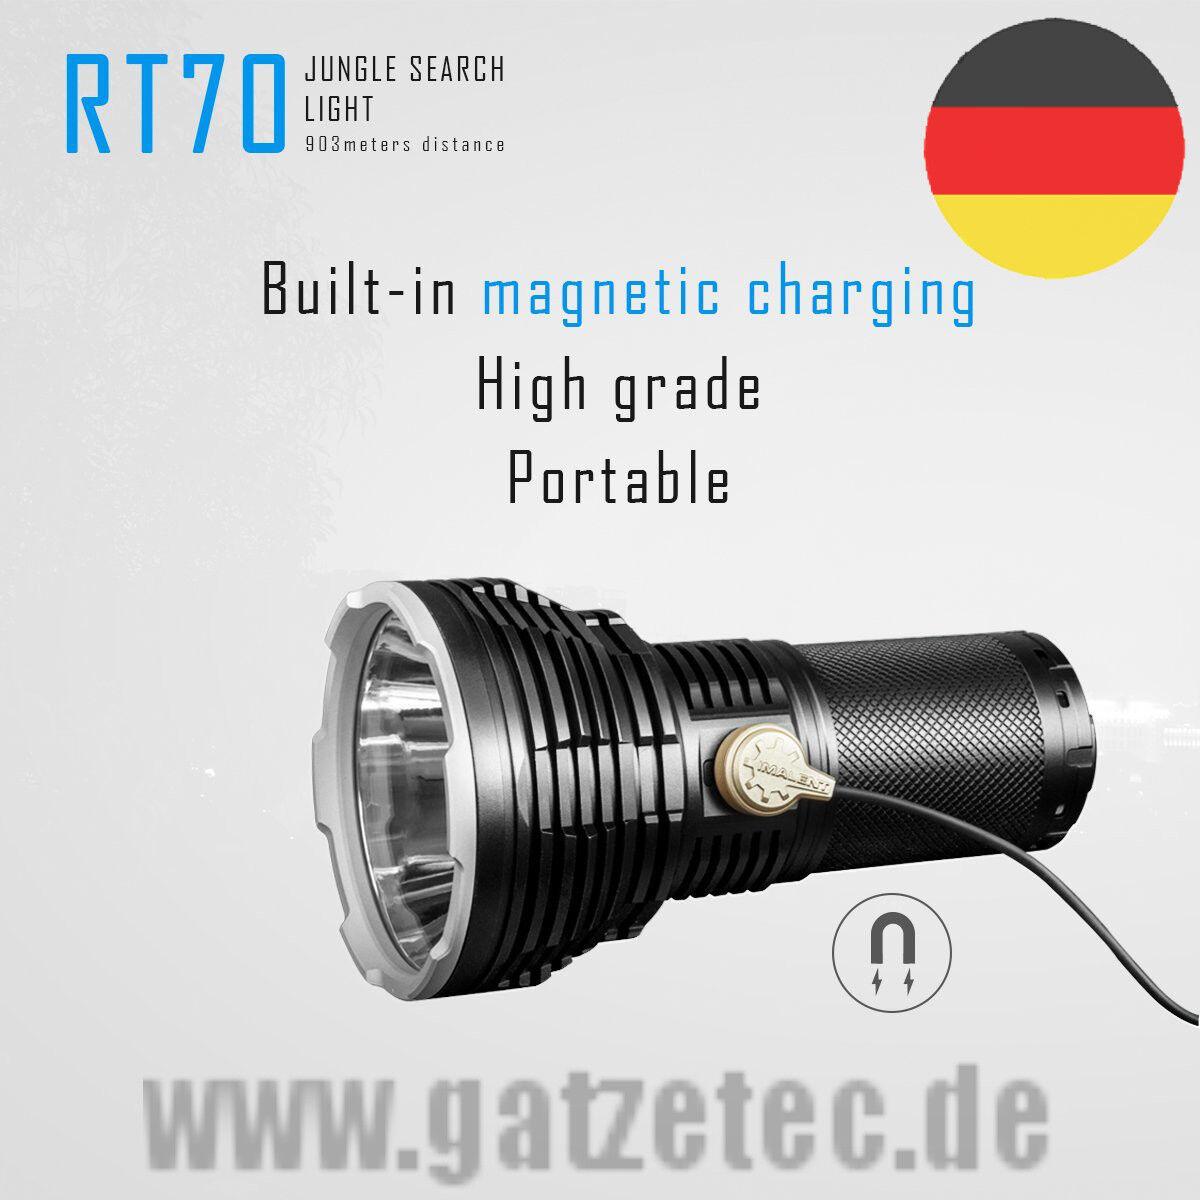 2019 Imalent RT 70 DEL Lampe de poche CREE XHP 70-2 5500 LM Kit incl. Batterie